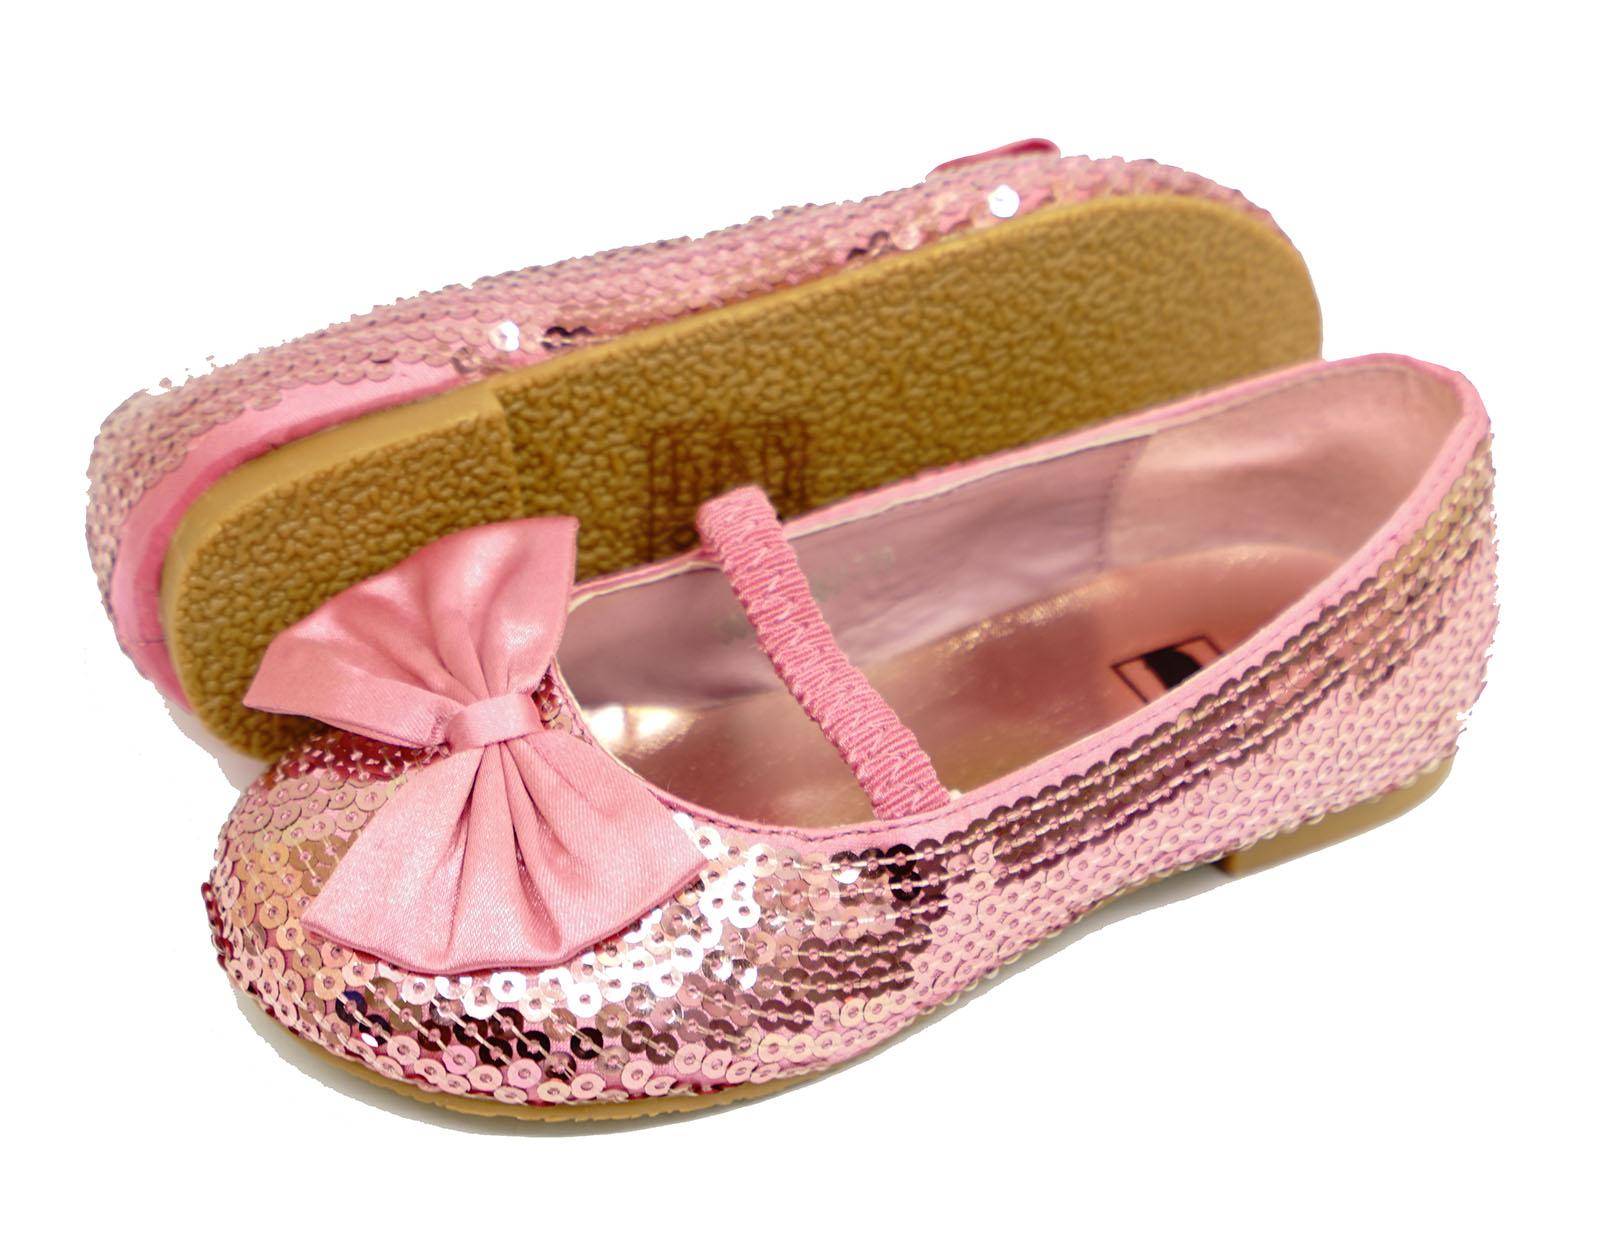 infantil rosa lentejuelas bailarina Manoletinas Dolly Ballet Zapato plano GB